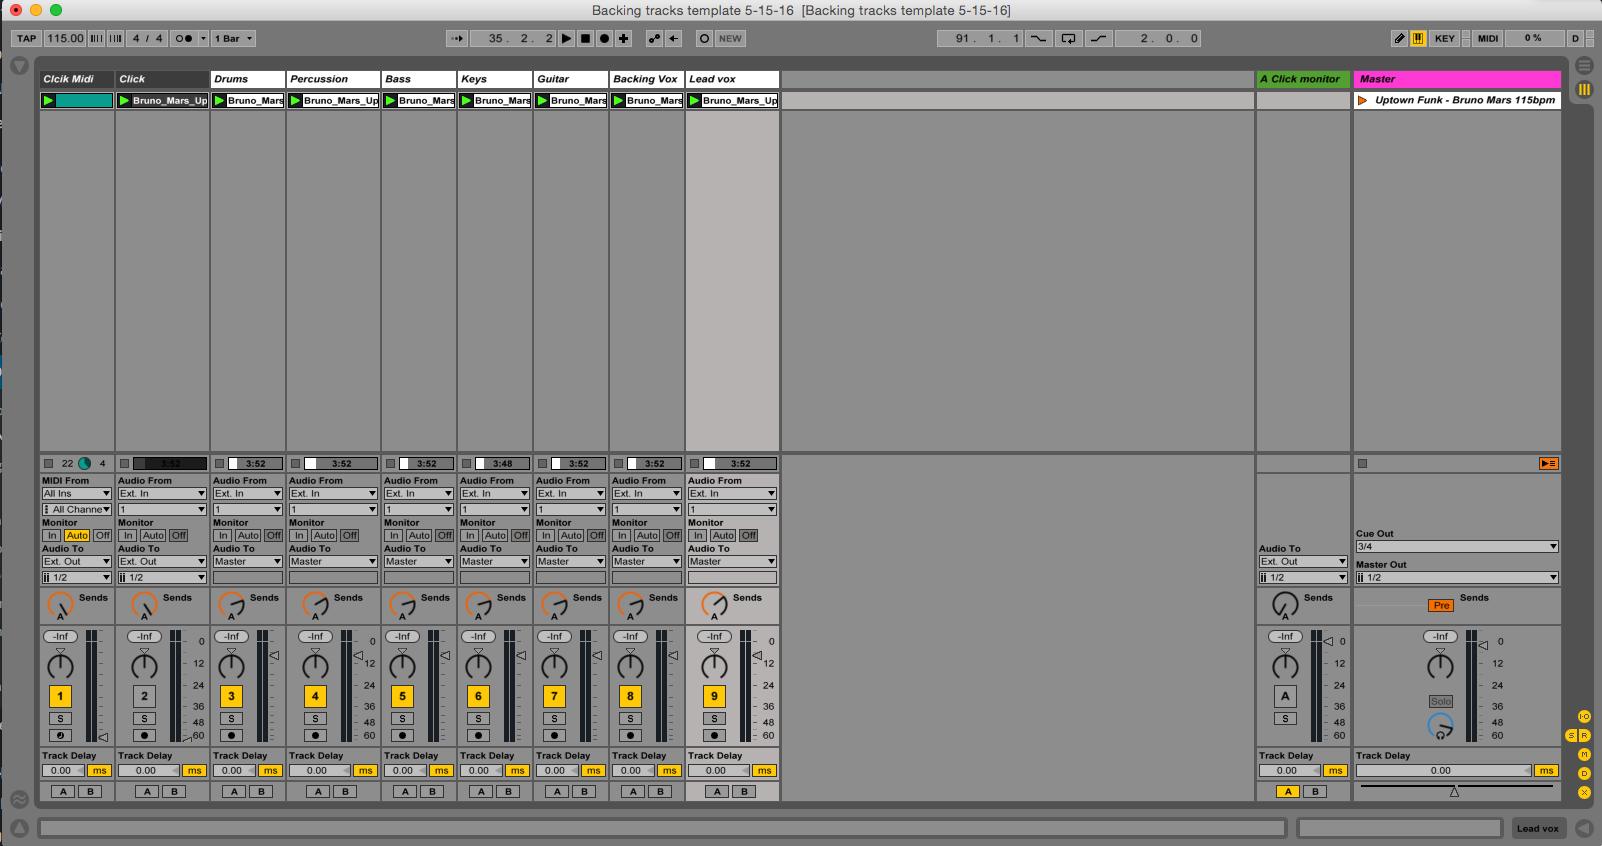 Ableton Backing Tracks Template